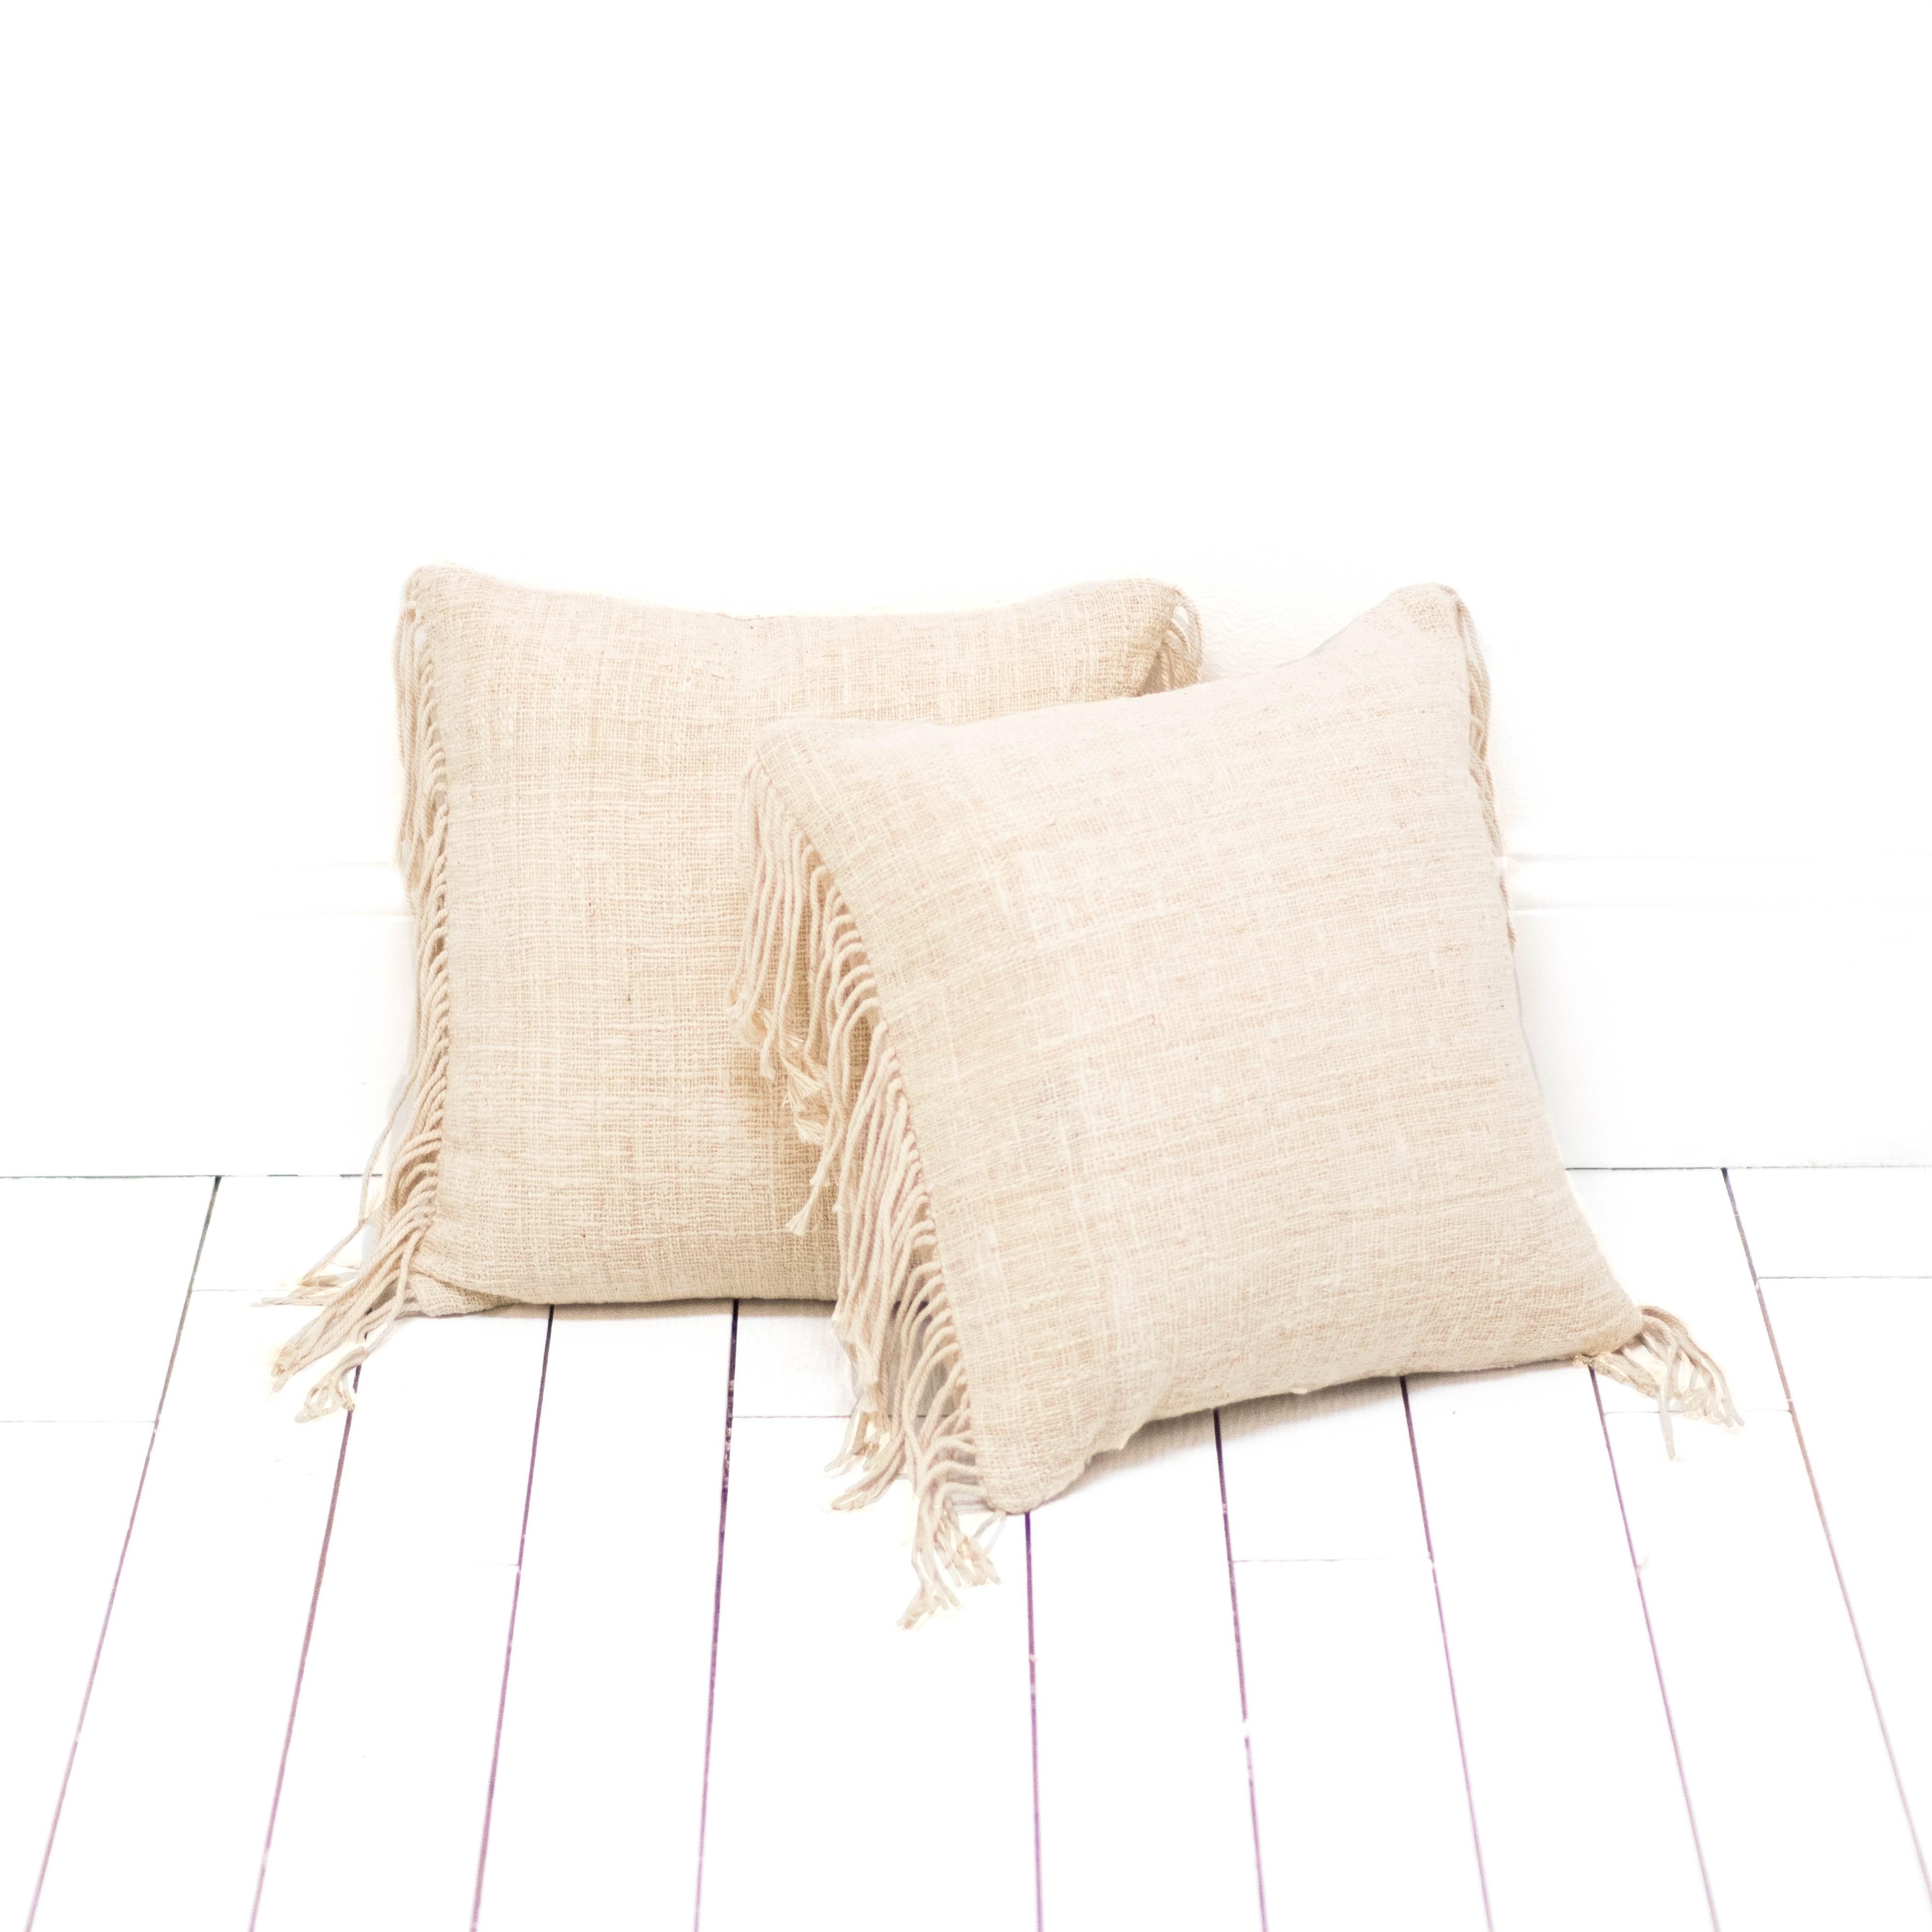 Carley Pillows